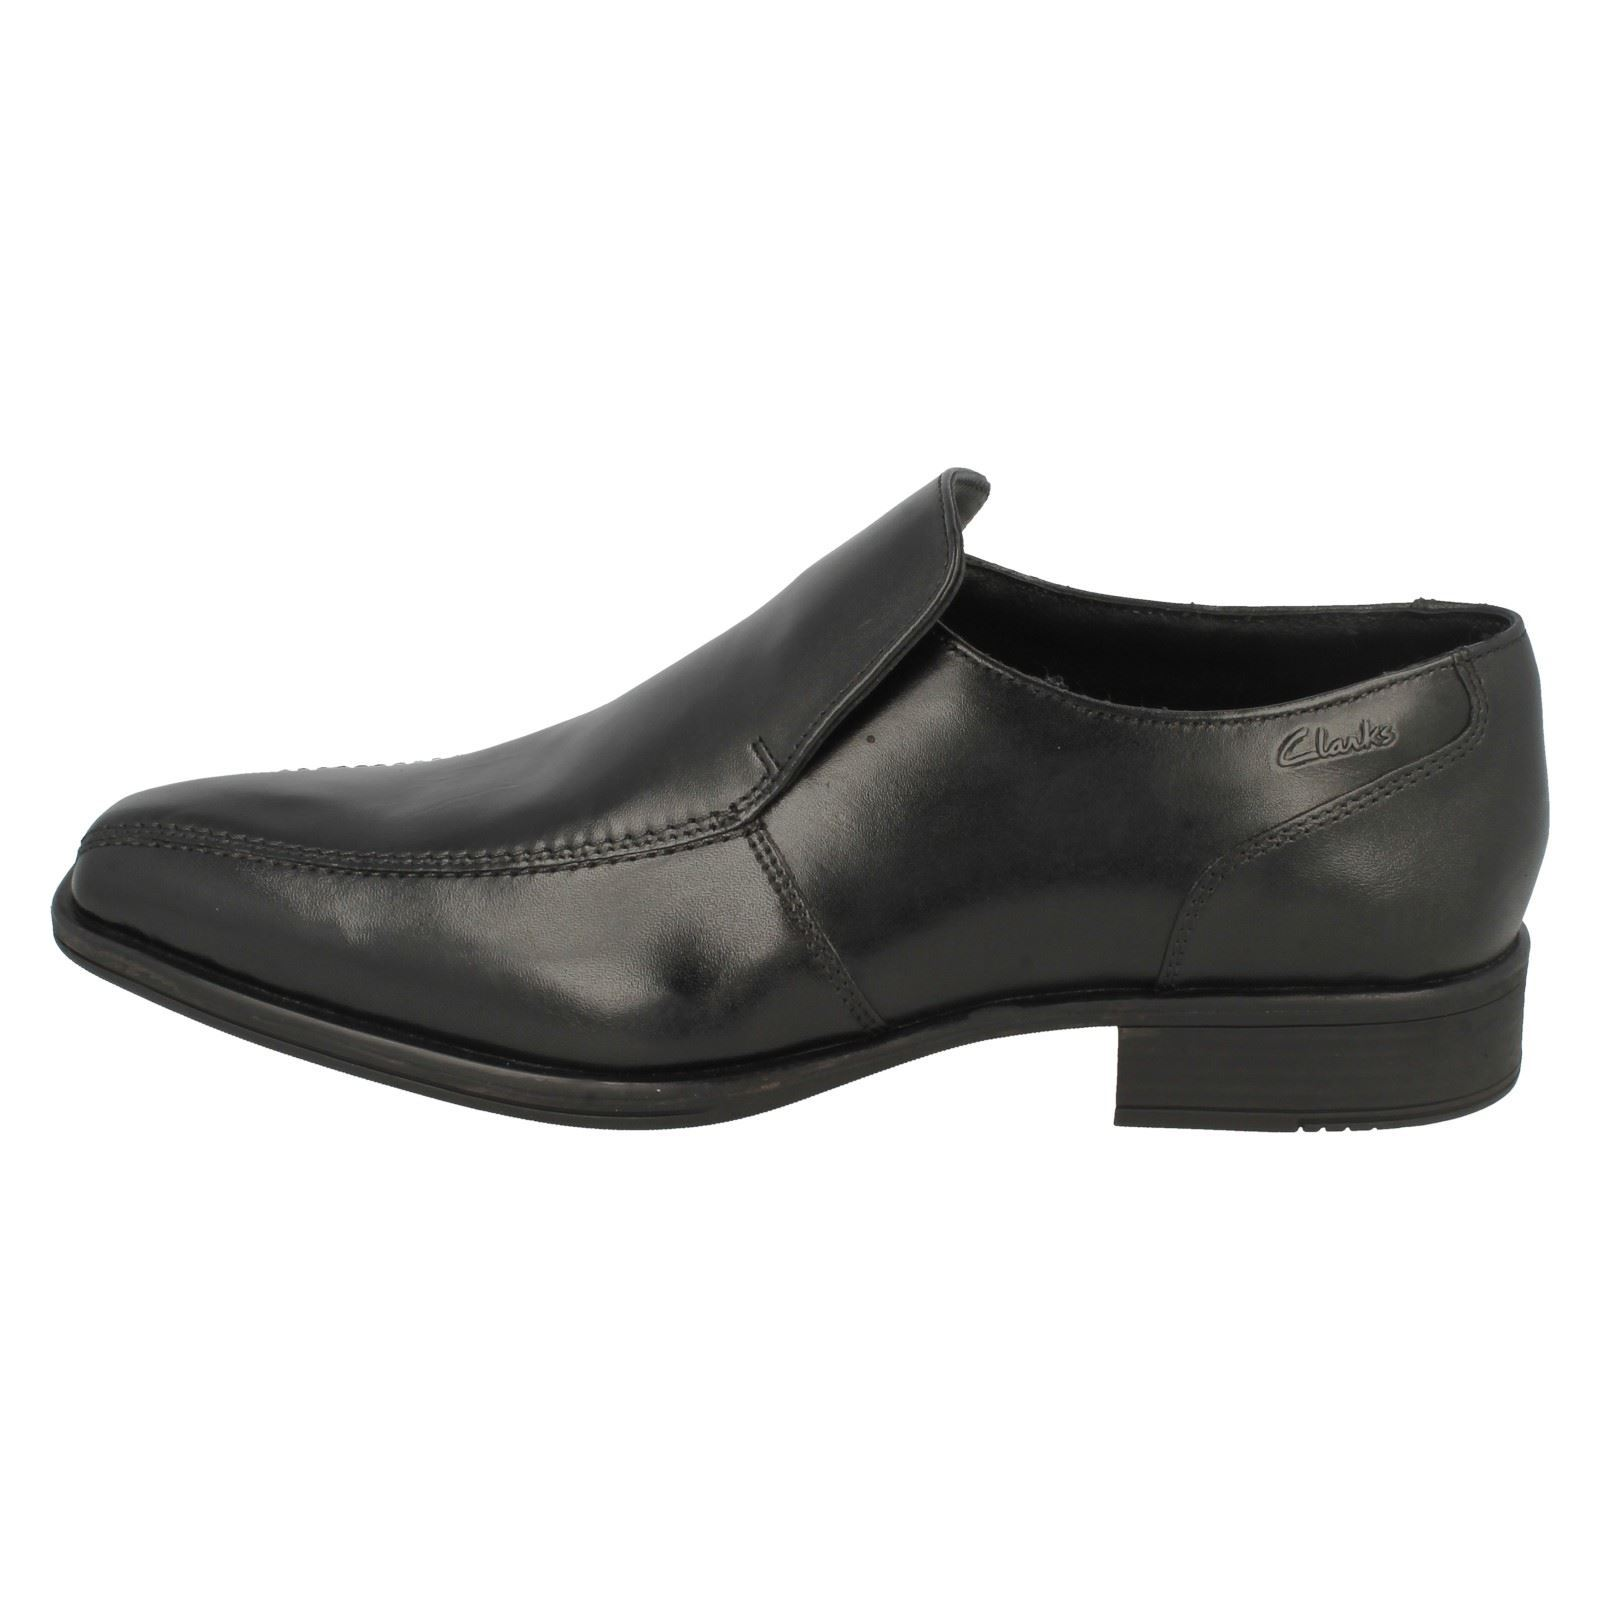 Slip Uomo Clarks Formal Slip  On Schuhes Flenk Step 763a7c